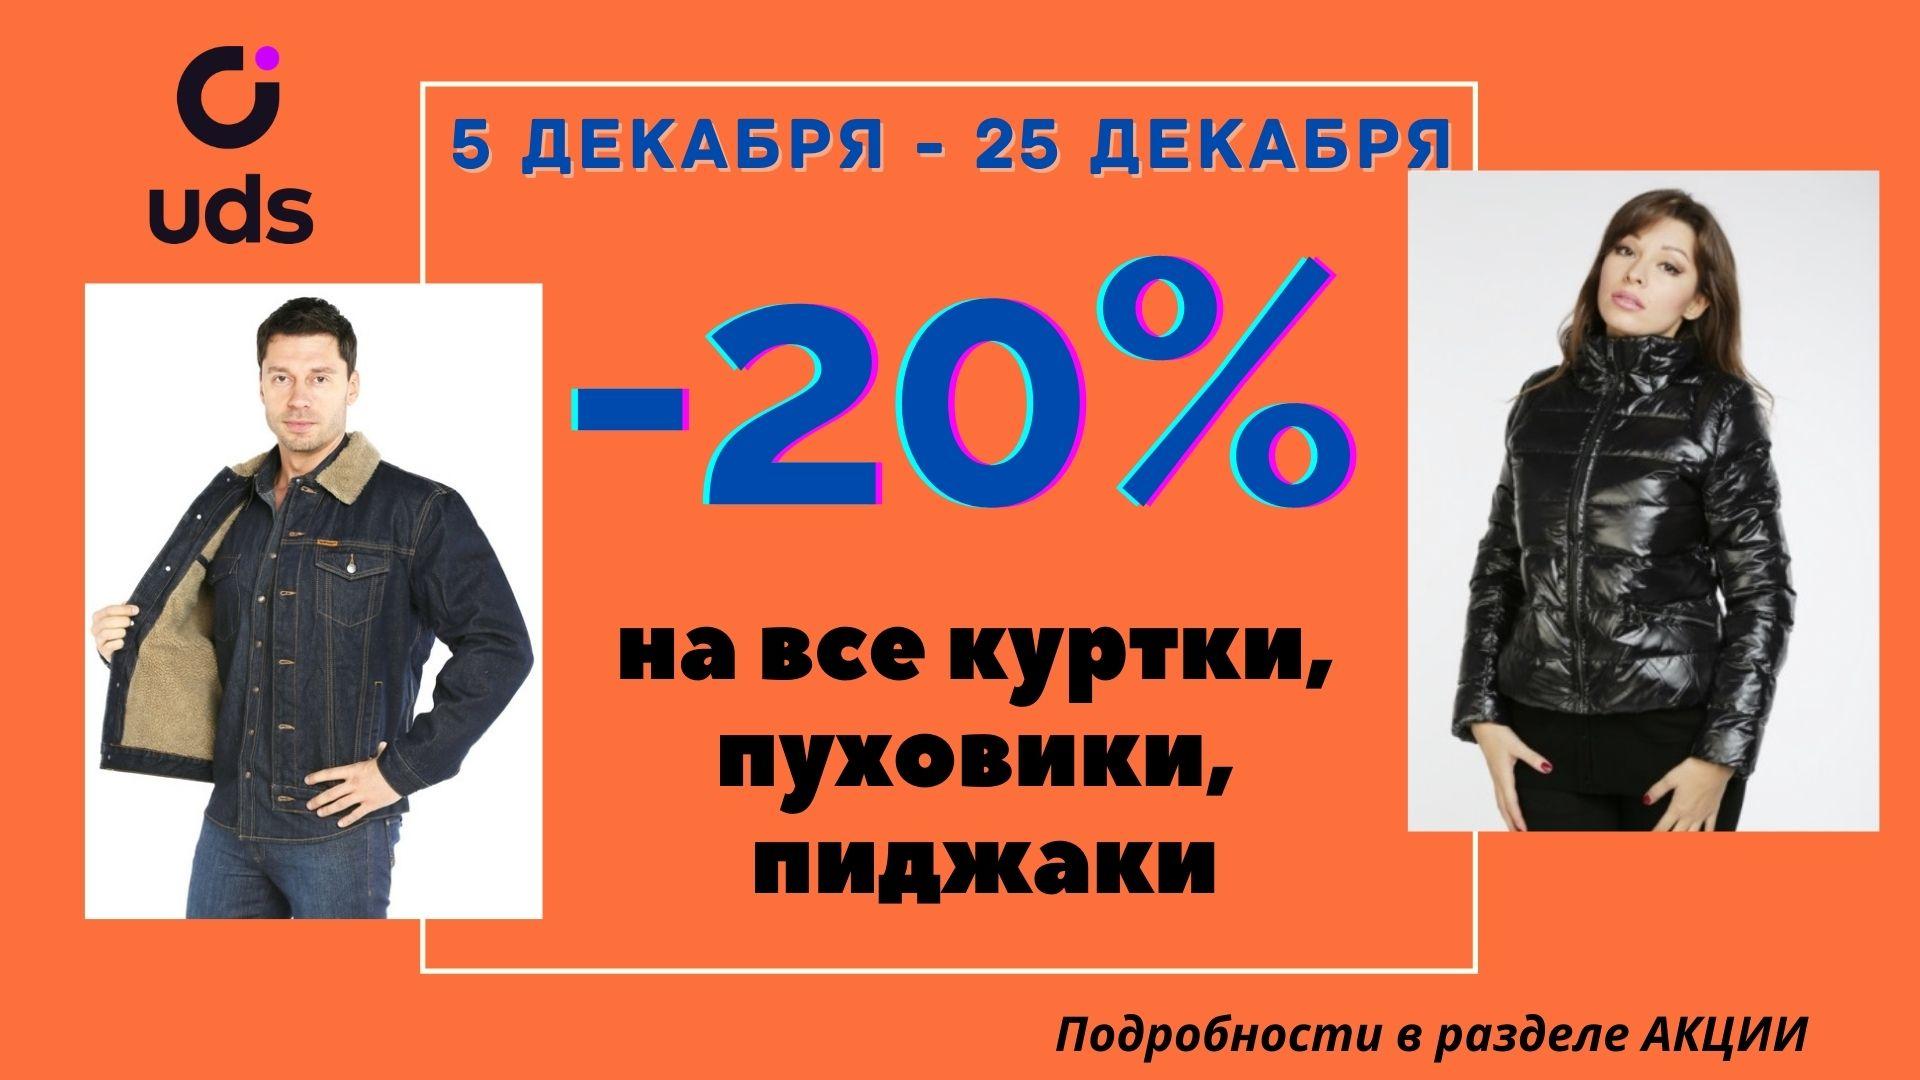 -20% на все куртки, пуховики, пиджаки